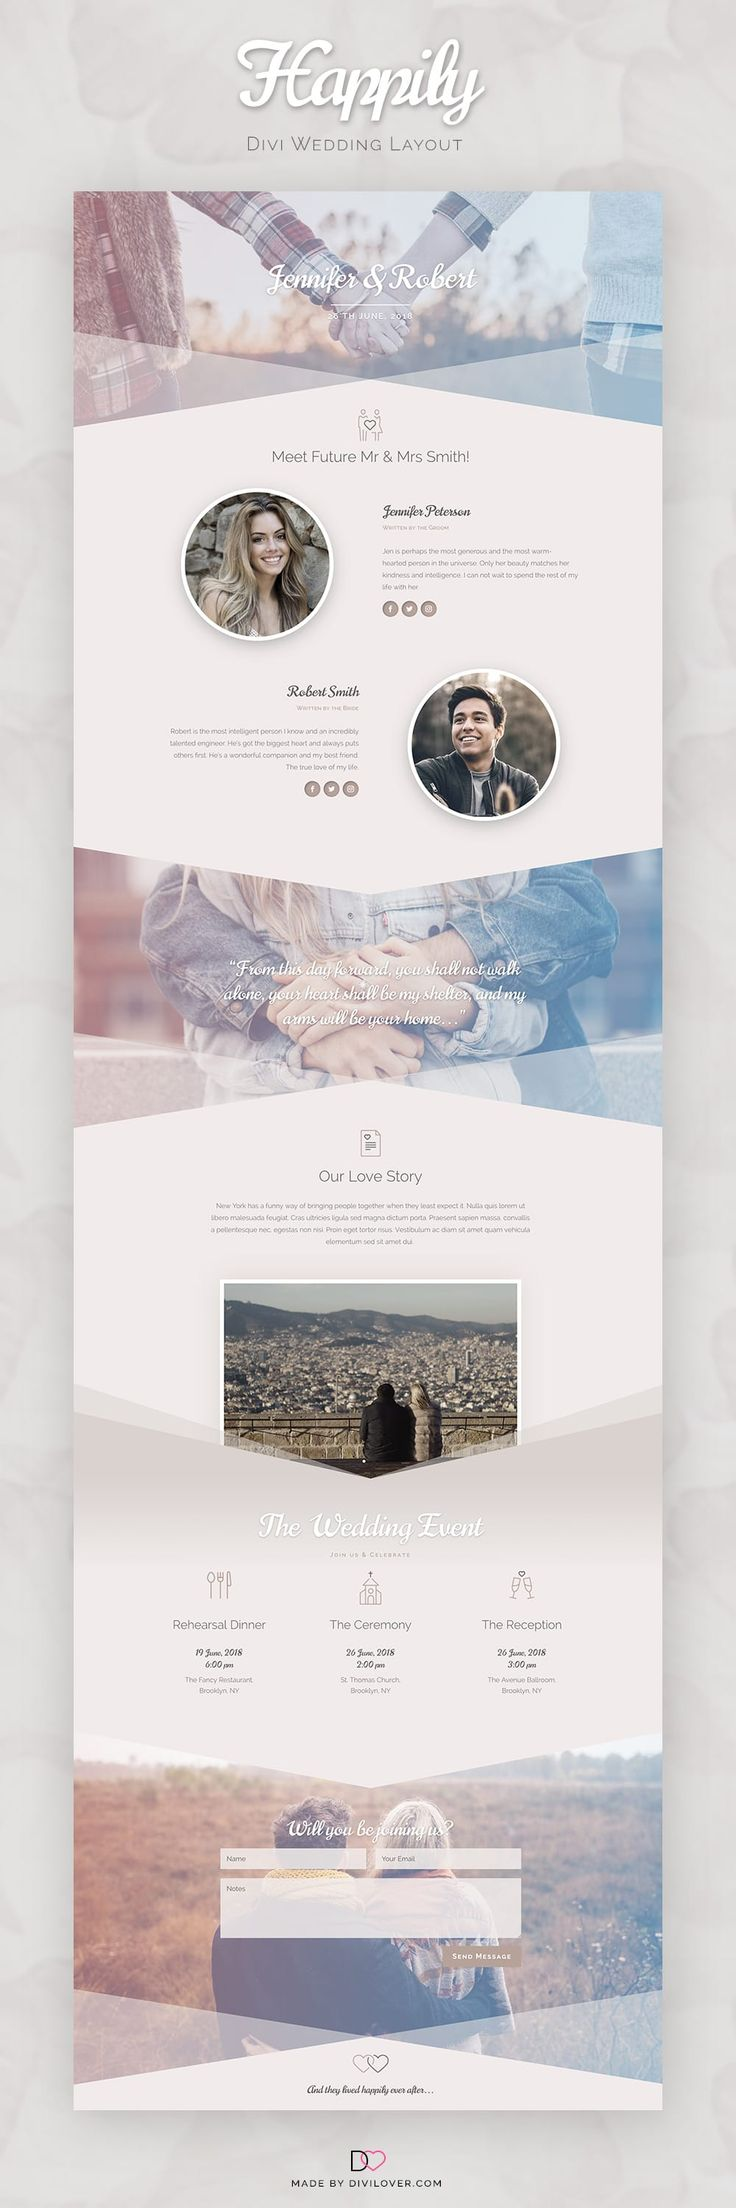 Free Wedding One Page Website Design for Divi WordPress Theme :) #divi #wedding #website #wordpress #free